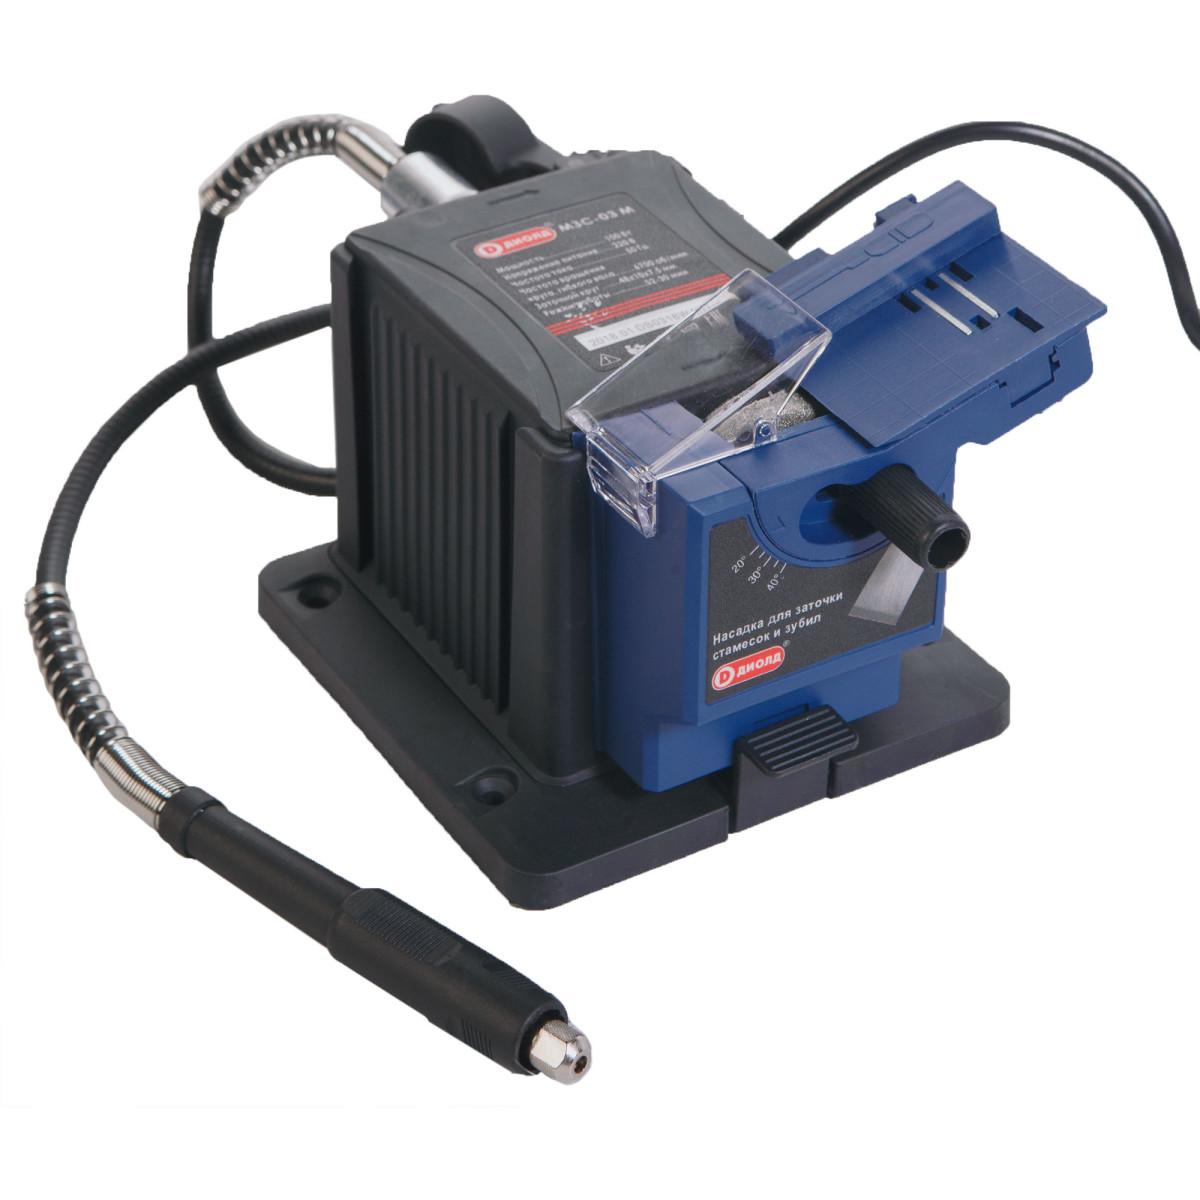 Точильный станокДиолд МЗС-03М100Вт 6700/мин 1.04 кг